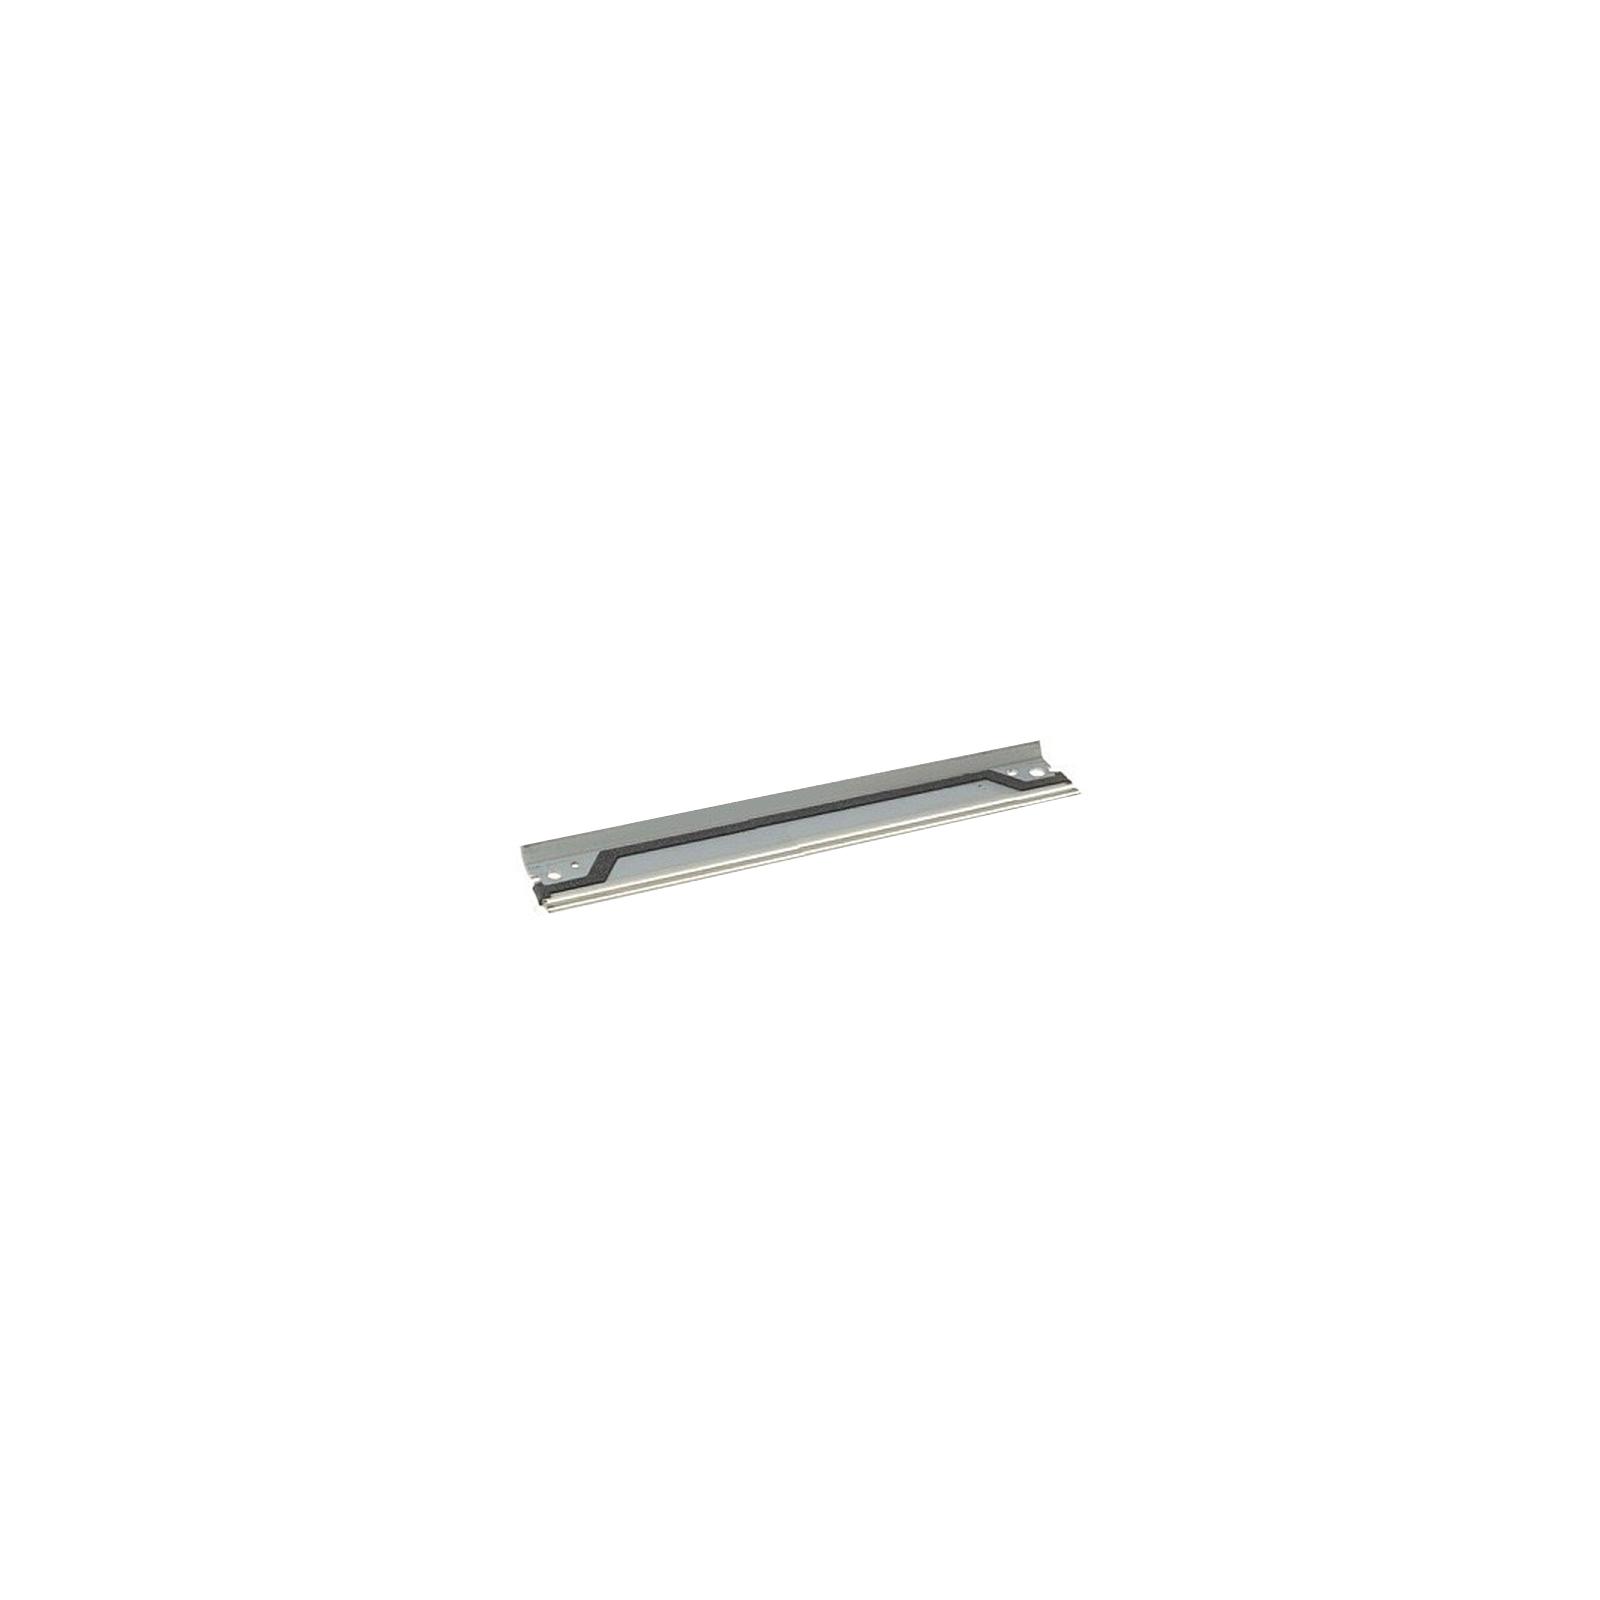 Чистящее лезвие HP LJ P2035/P2055 Static Control (HP2055BLADE/HP2055BLADE2)